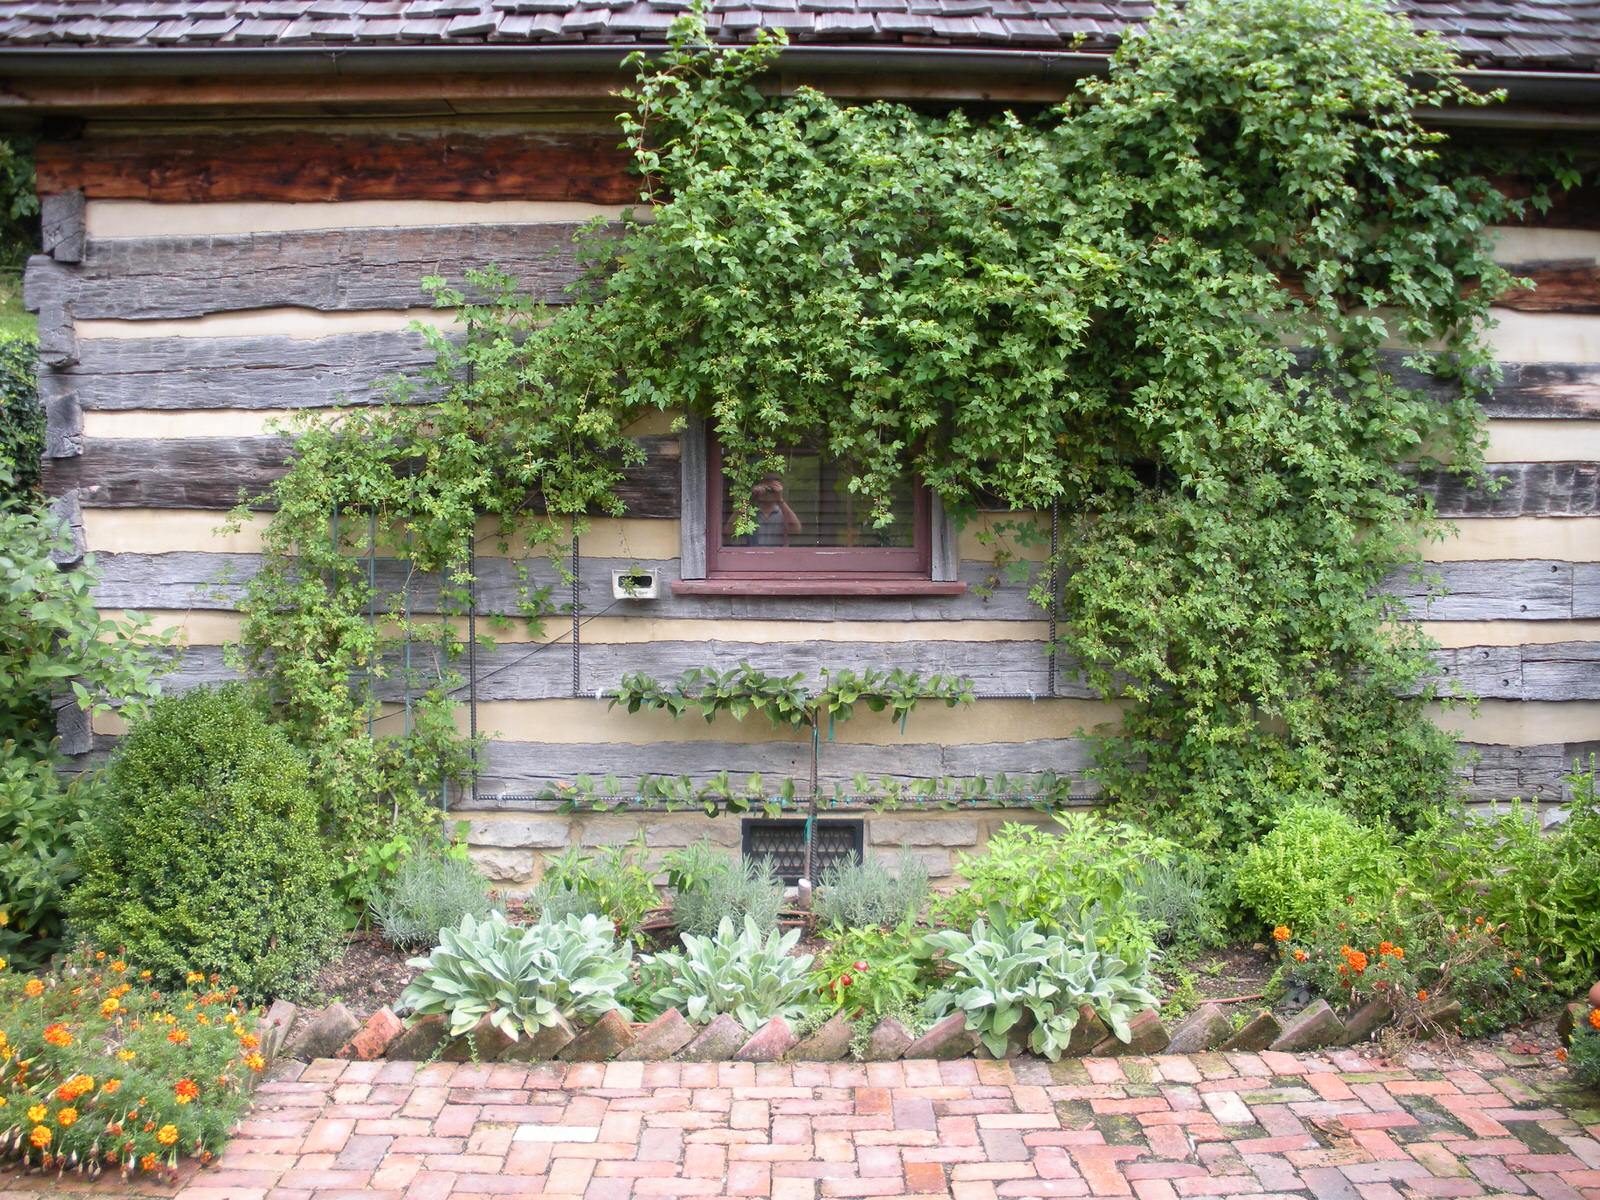 Justin Stelter Landscape Gardening - Country Garden - Justin Stelter Landscape Gardening - Country Garden2886257301_08d85e3a66_o.jpg